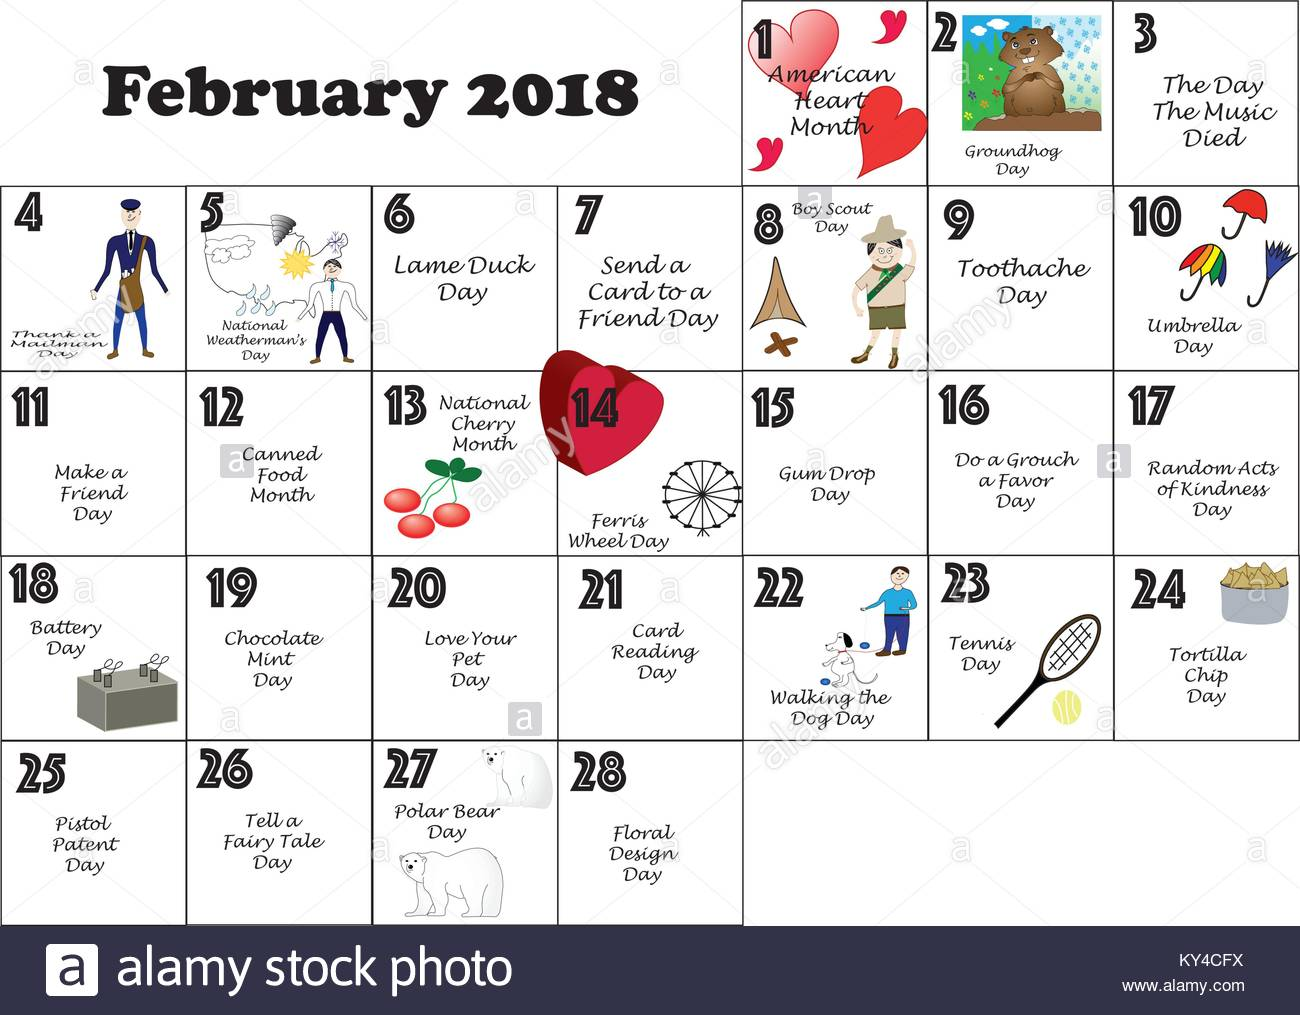 Calendario Con Festivita.Febbraio 2018 Calendario Illustrato E Annotata Con Daily